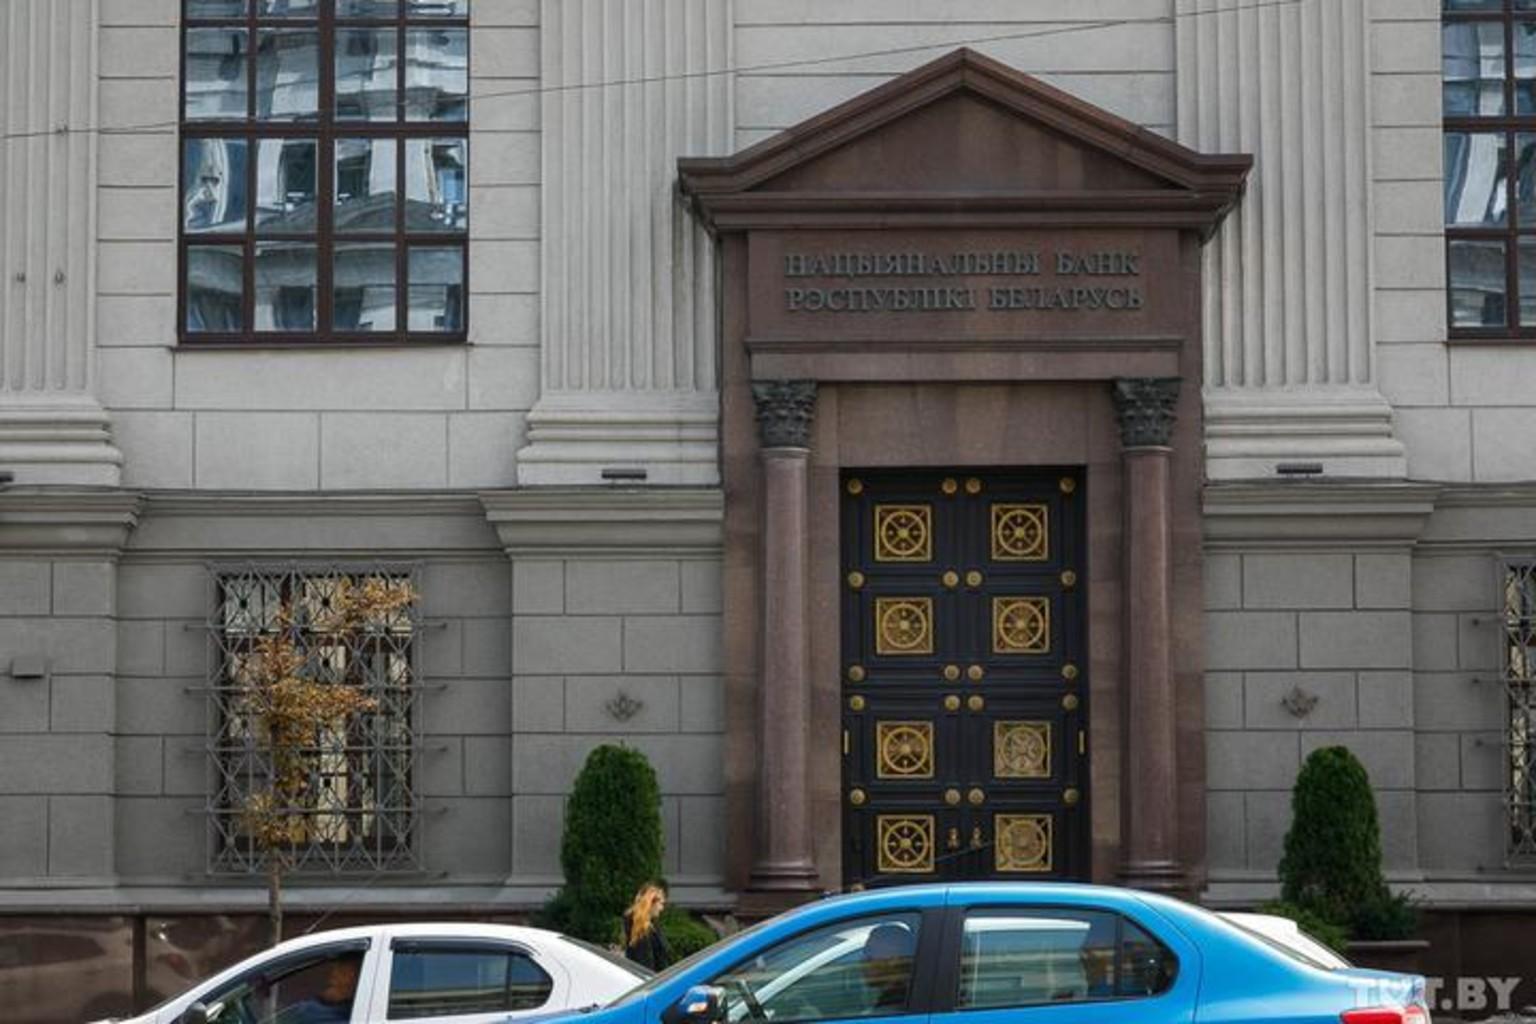 Nacionalnyi bank nacbank 20190730 shuk tutby phsl 1740